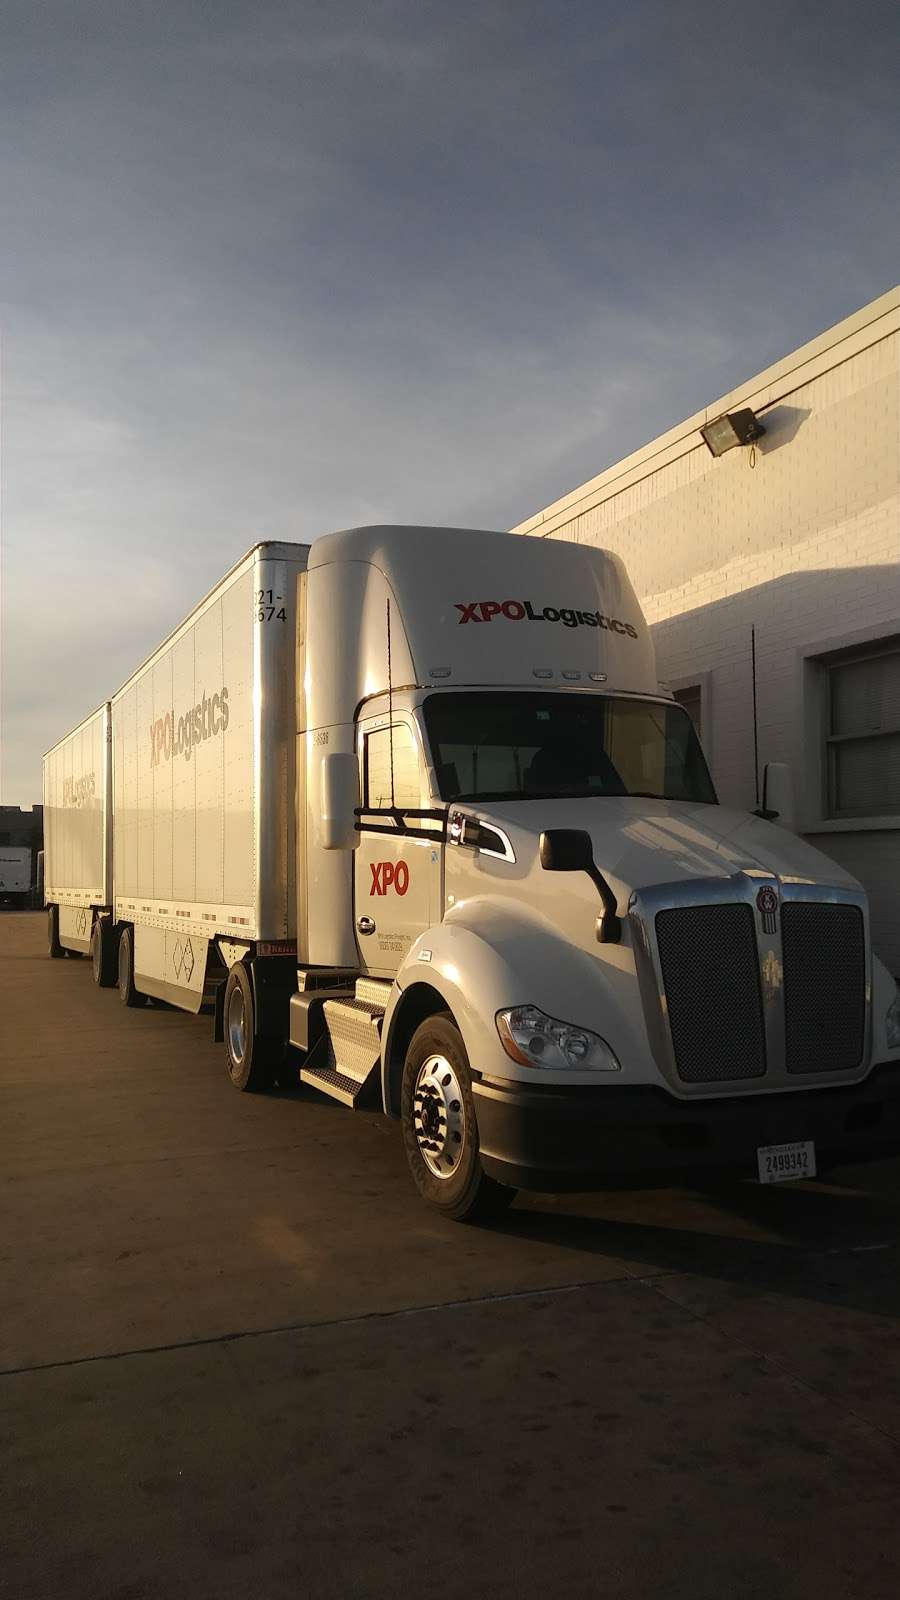 XPO Logistics - moving company  | Photo 3 of 10 | Address: 5020 Calvert St, Dallas, TX 75247, USA | Phone: (214) 631-5486